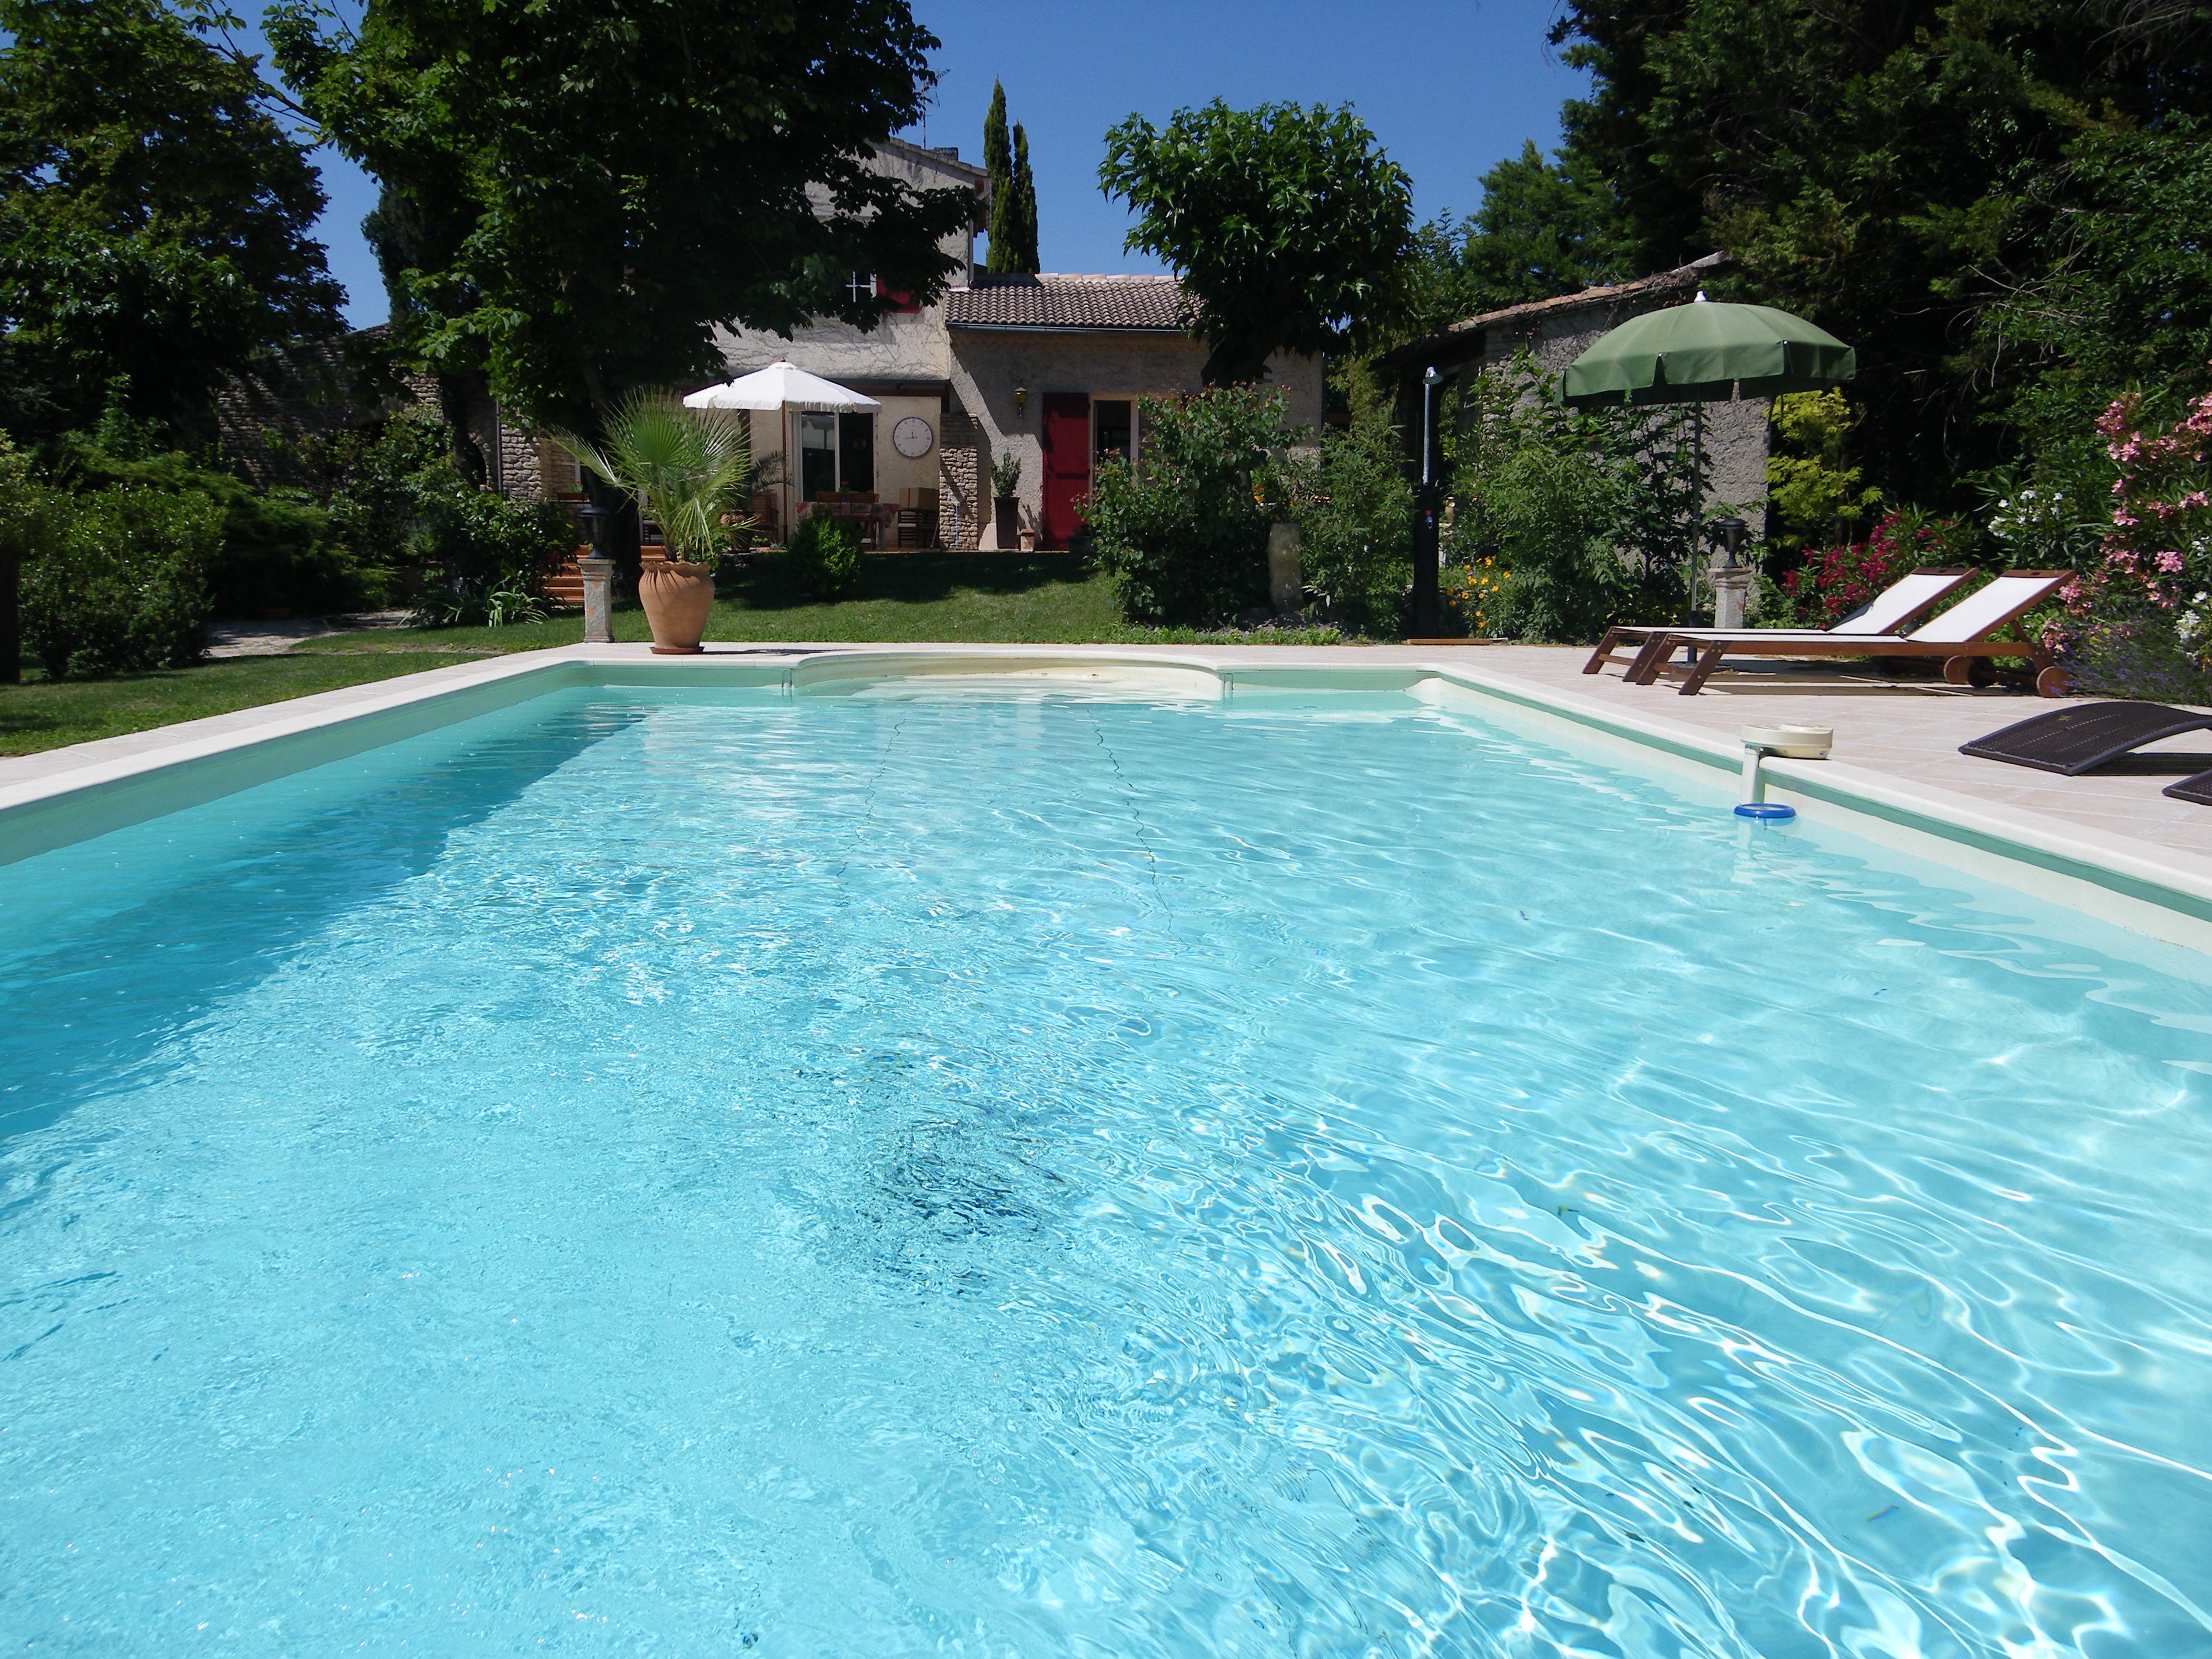 B&B piscine Velleron Vaucluse